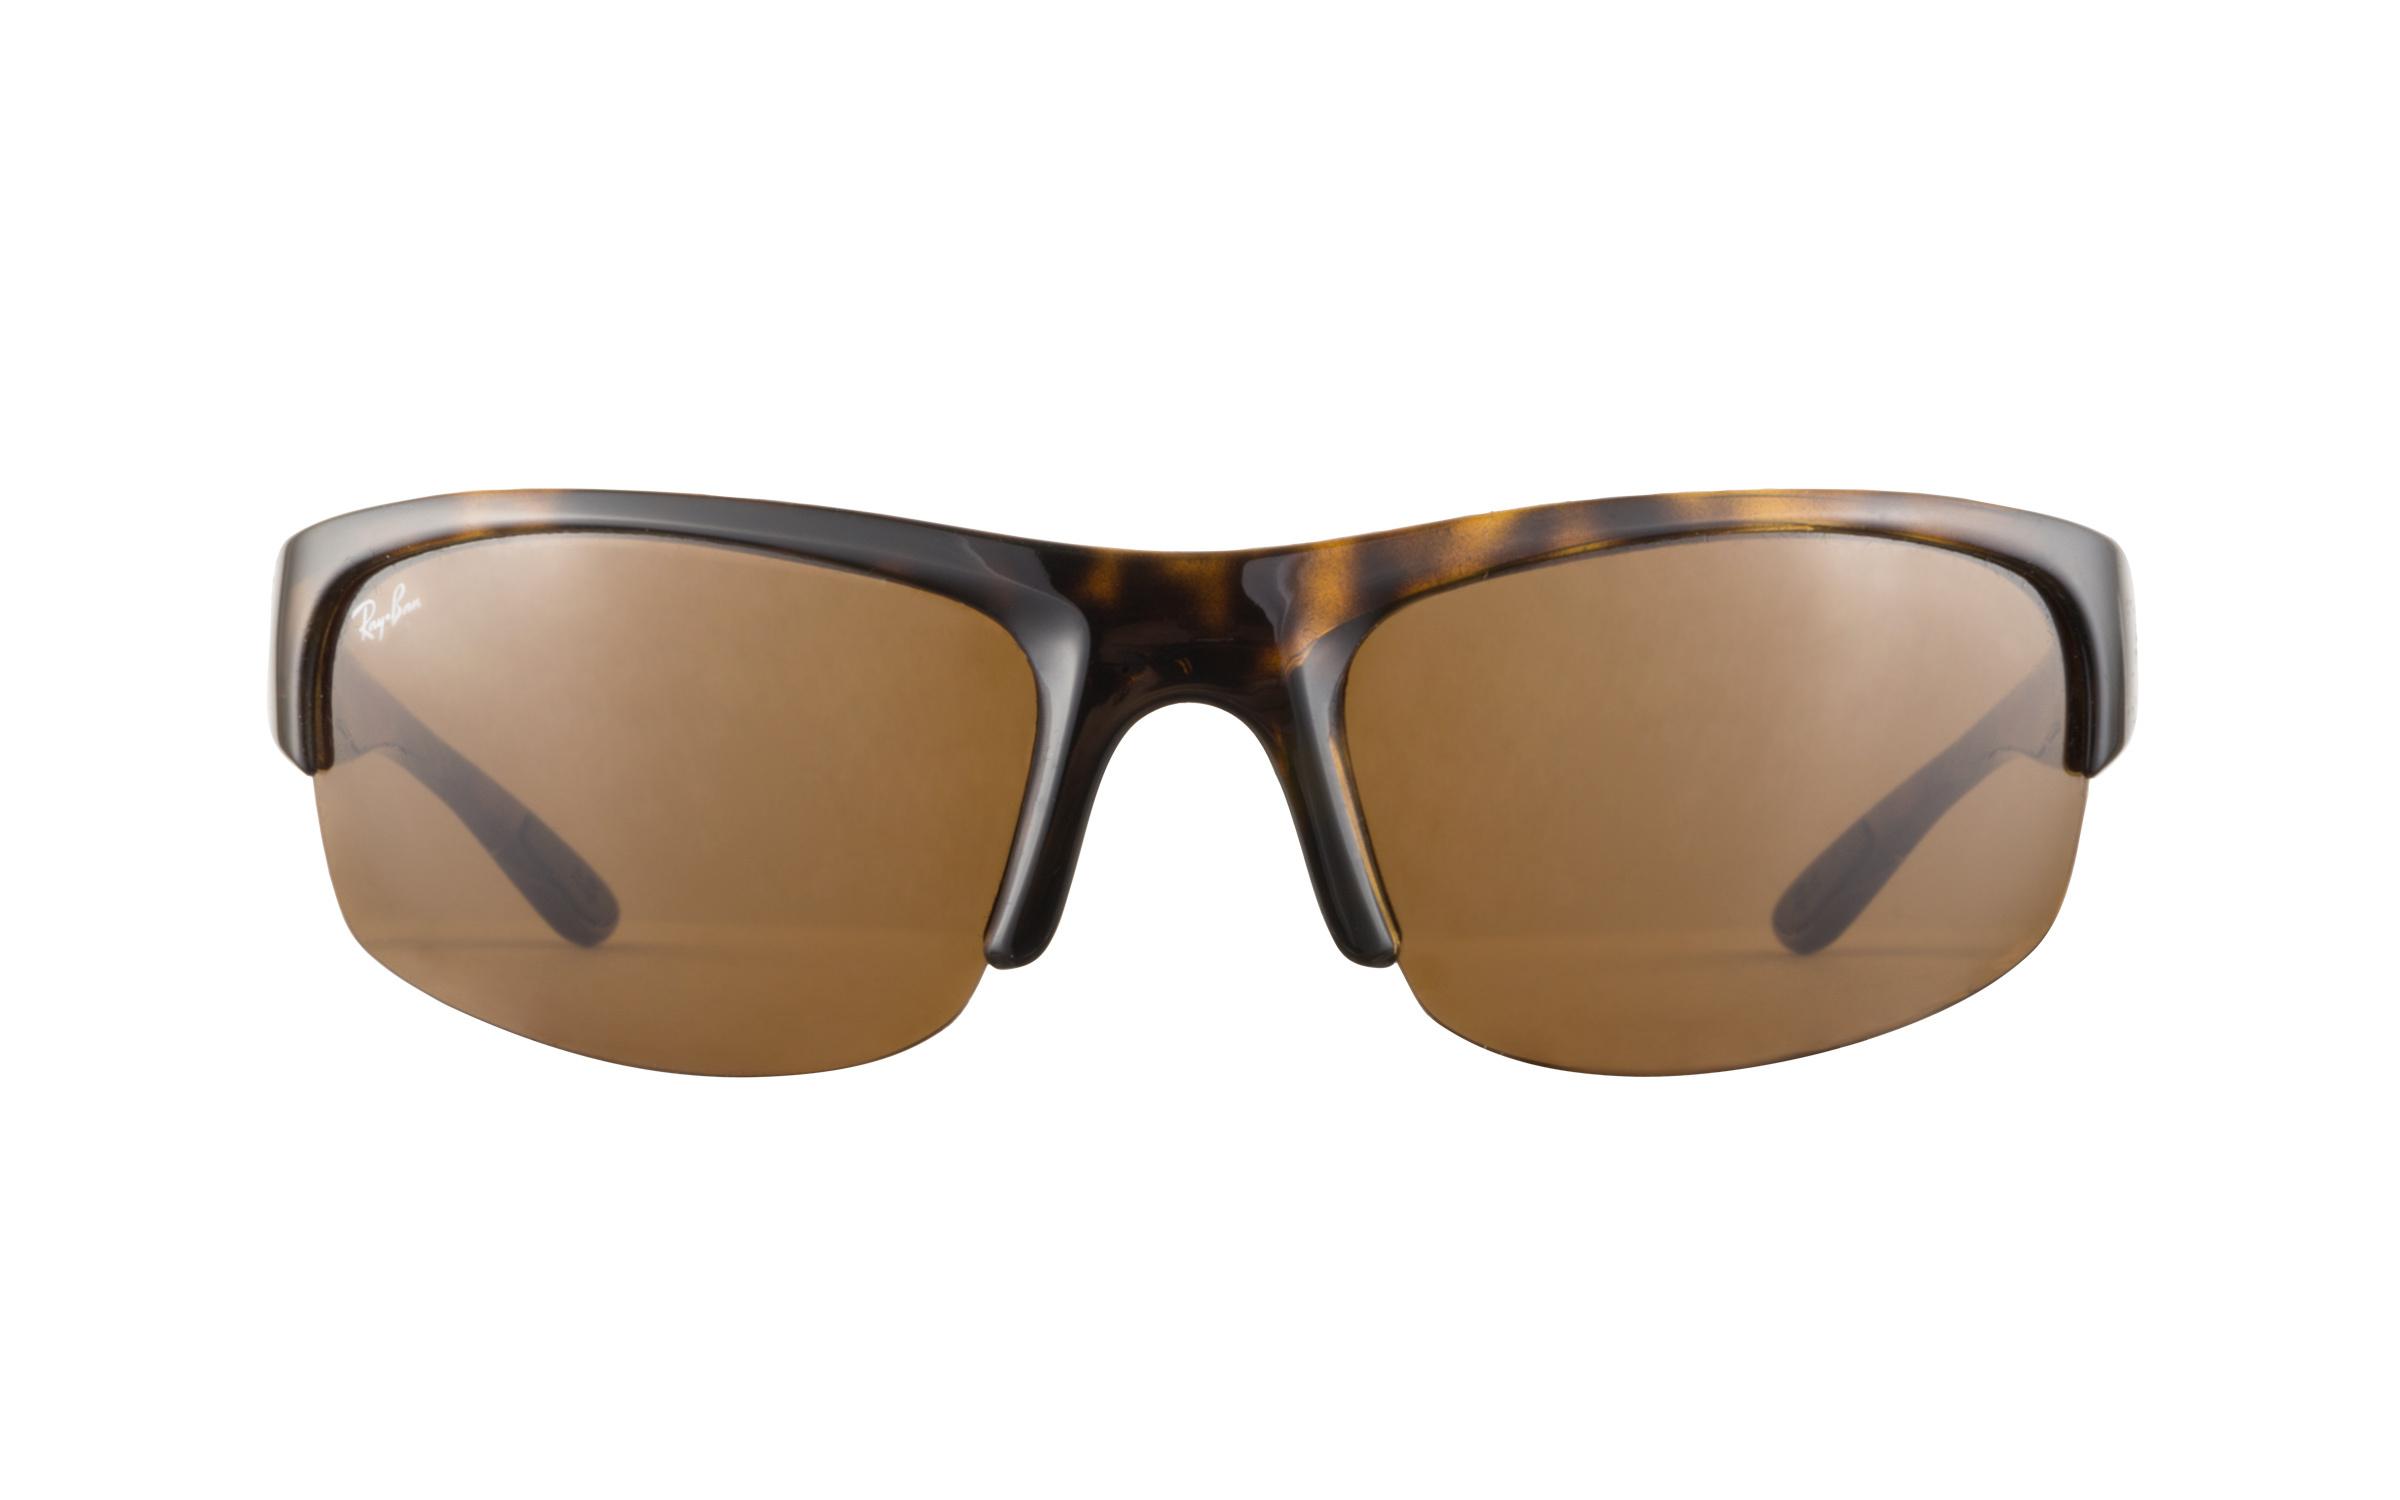 Ray-Ban RB4173 710 73 Havana 62 Sunglasses